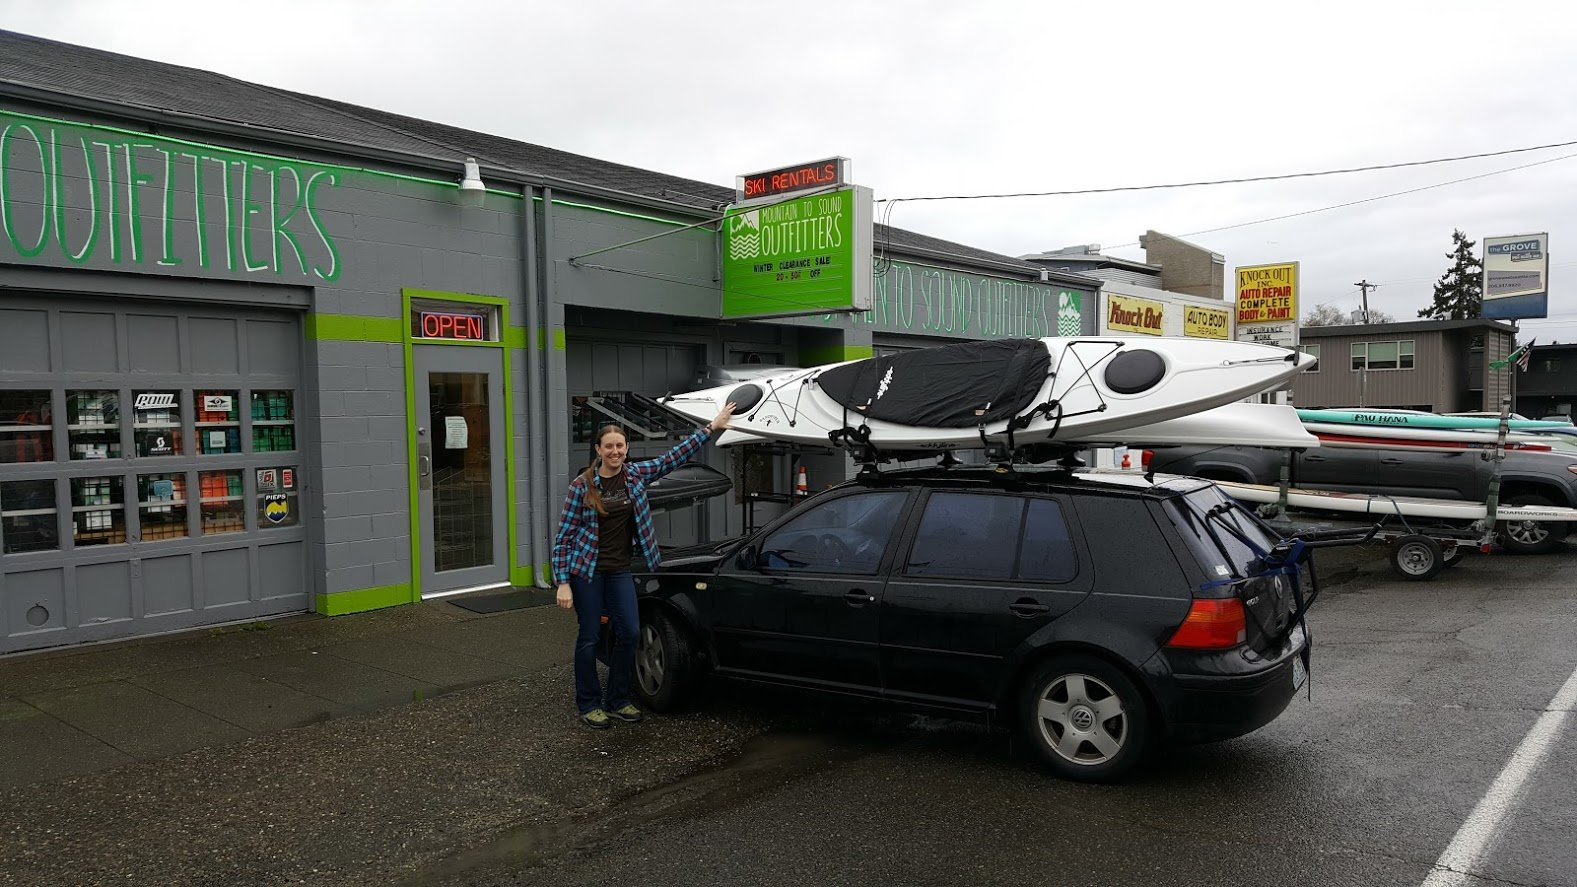 Vehicle racks installed